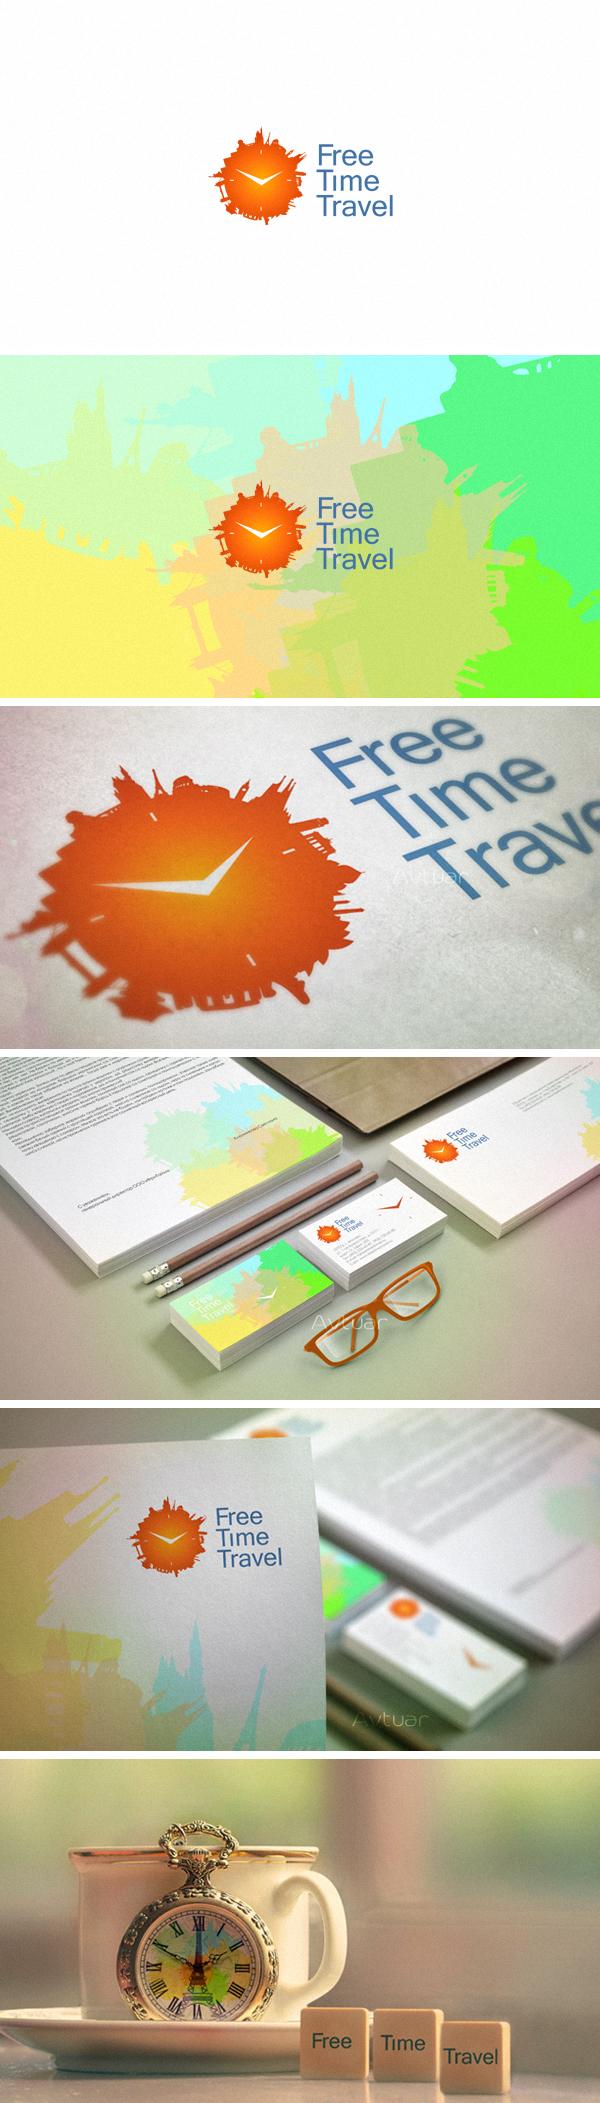 Free Time Travel